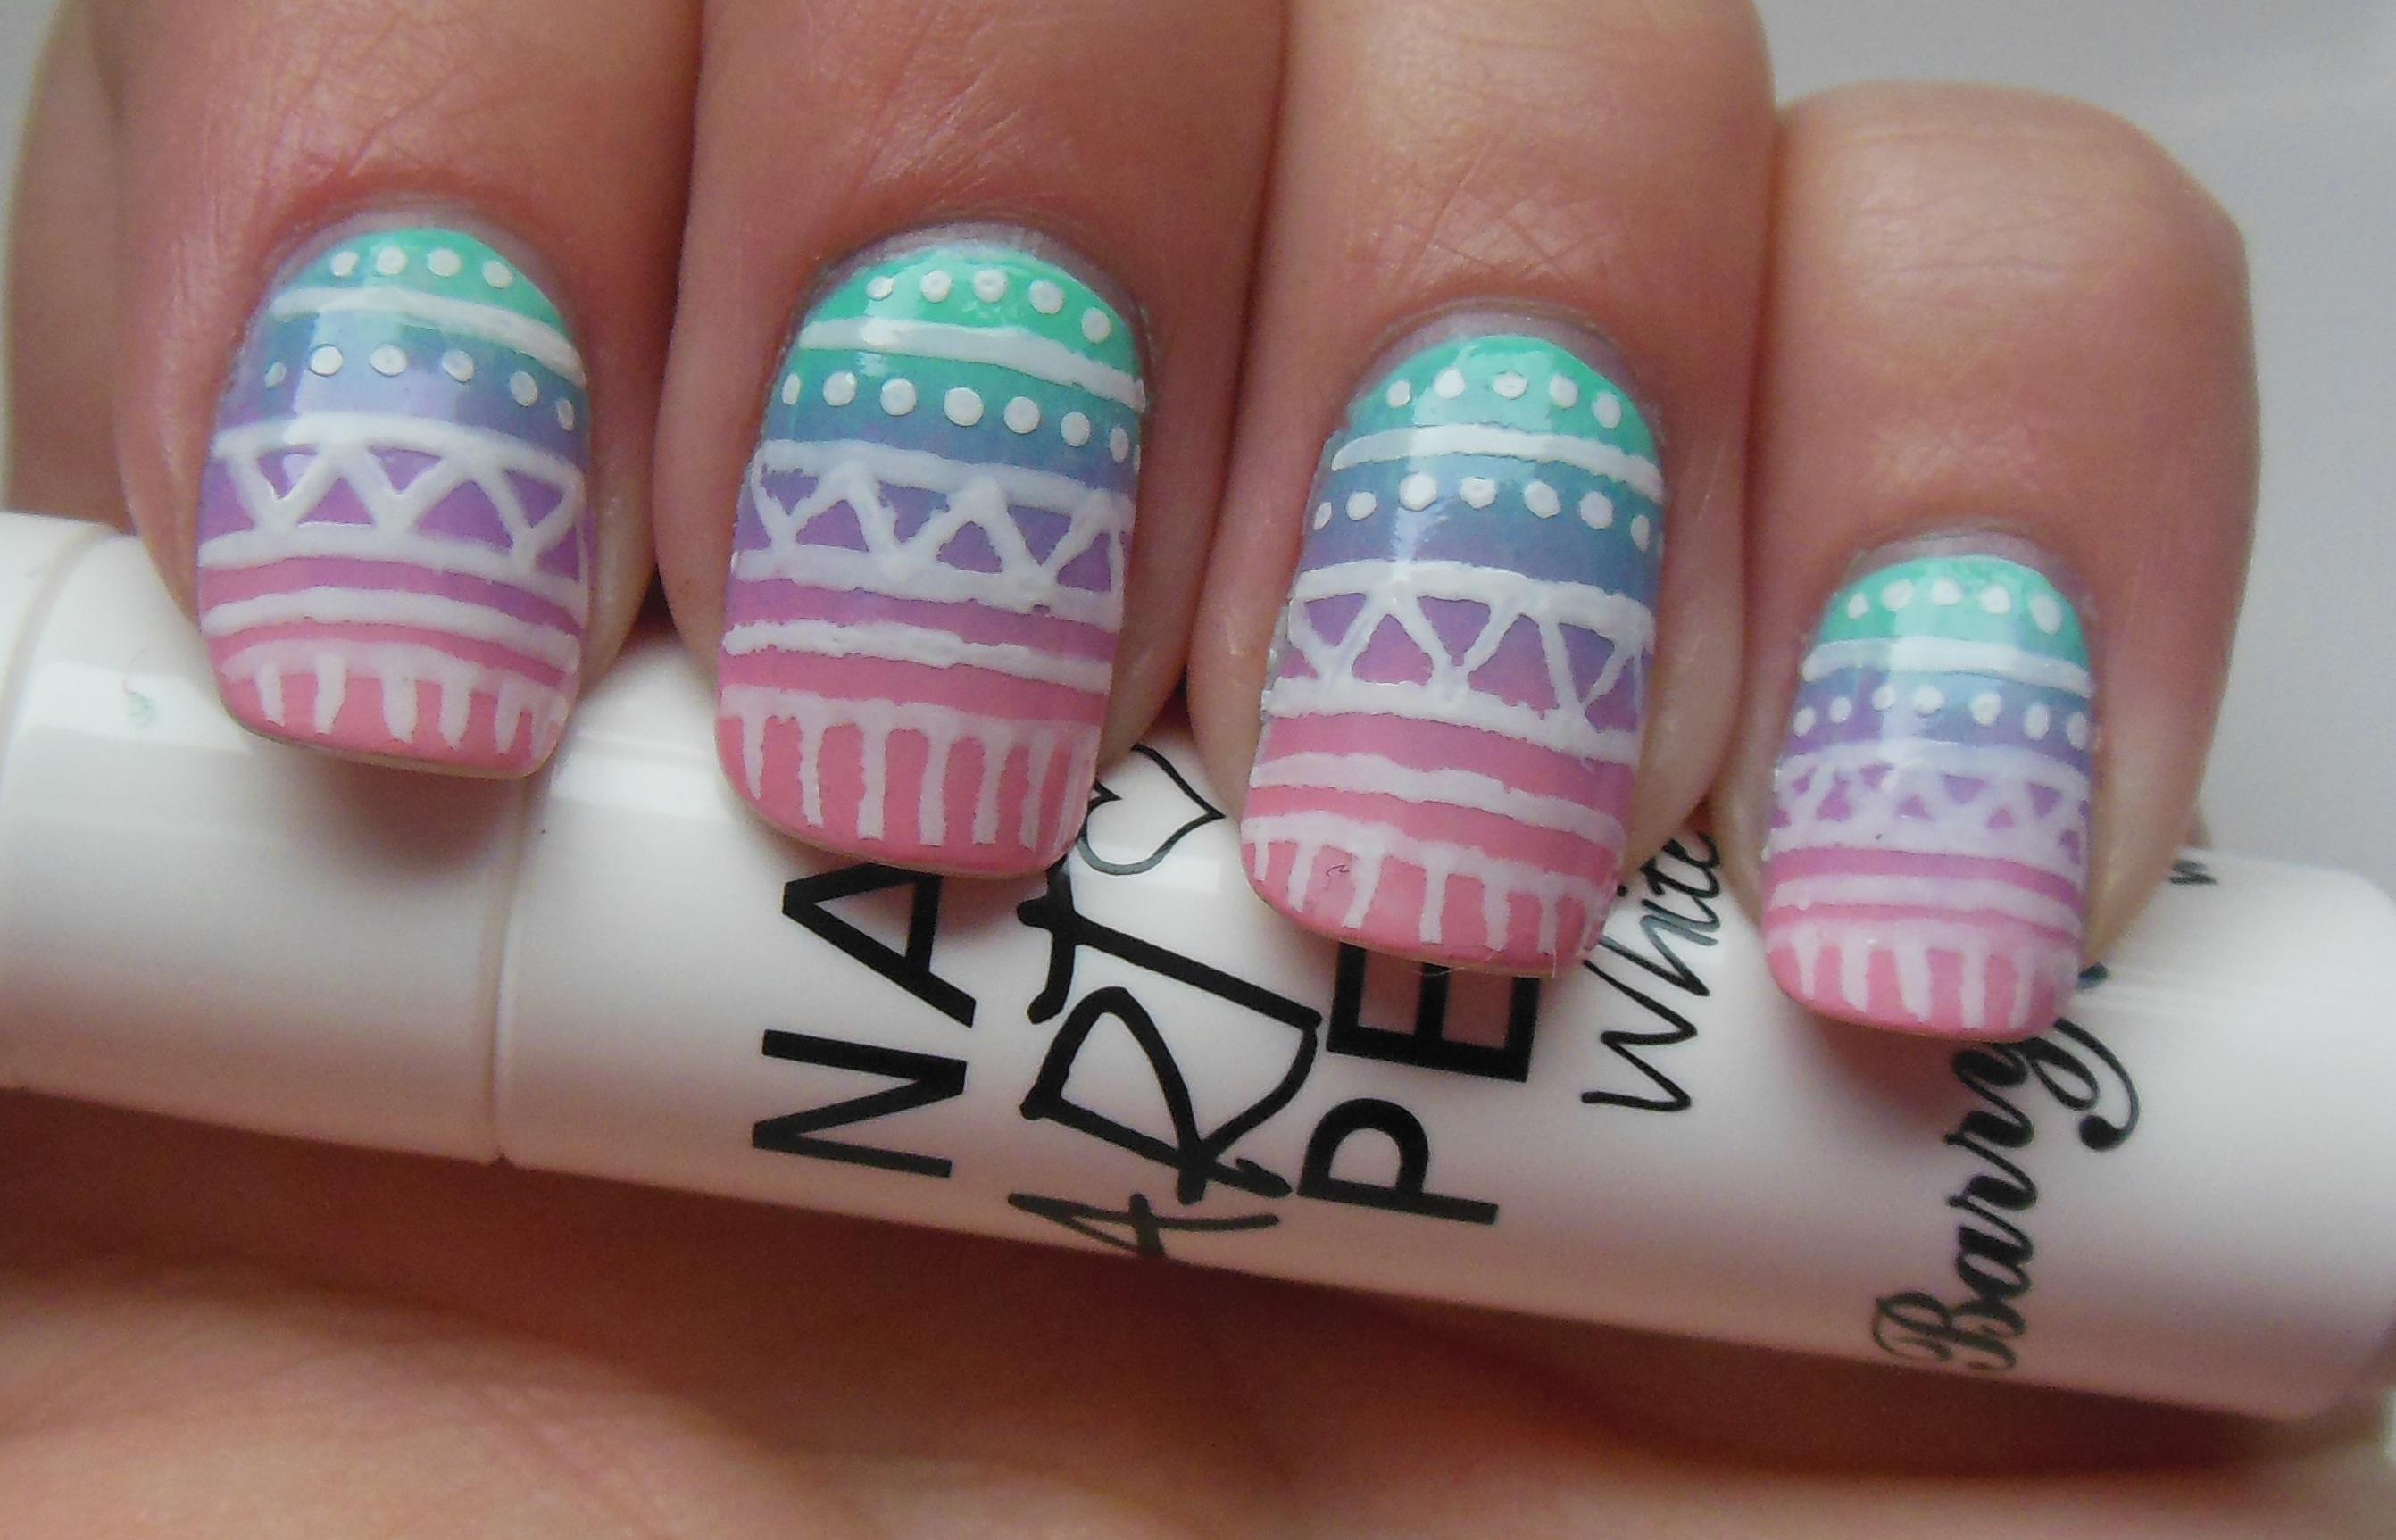 Gradient Nail Art A Sparkling Finish